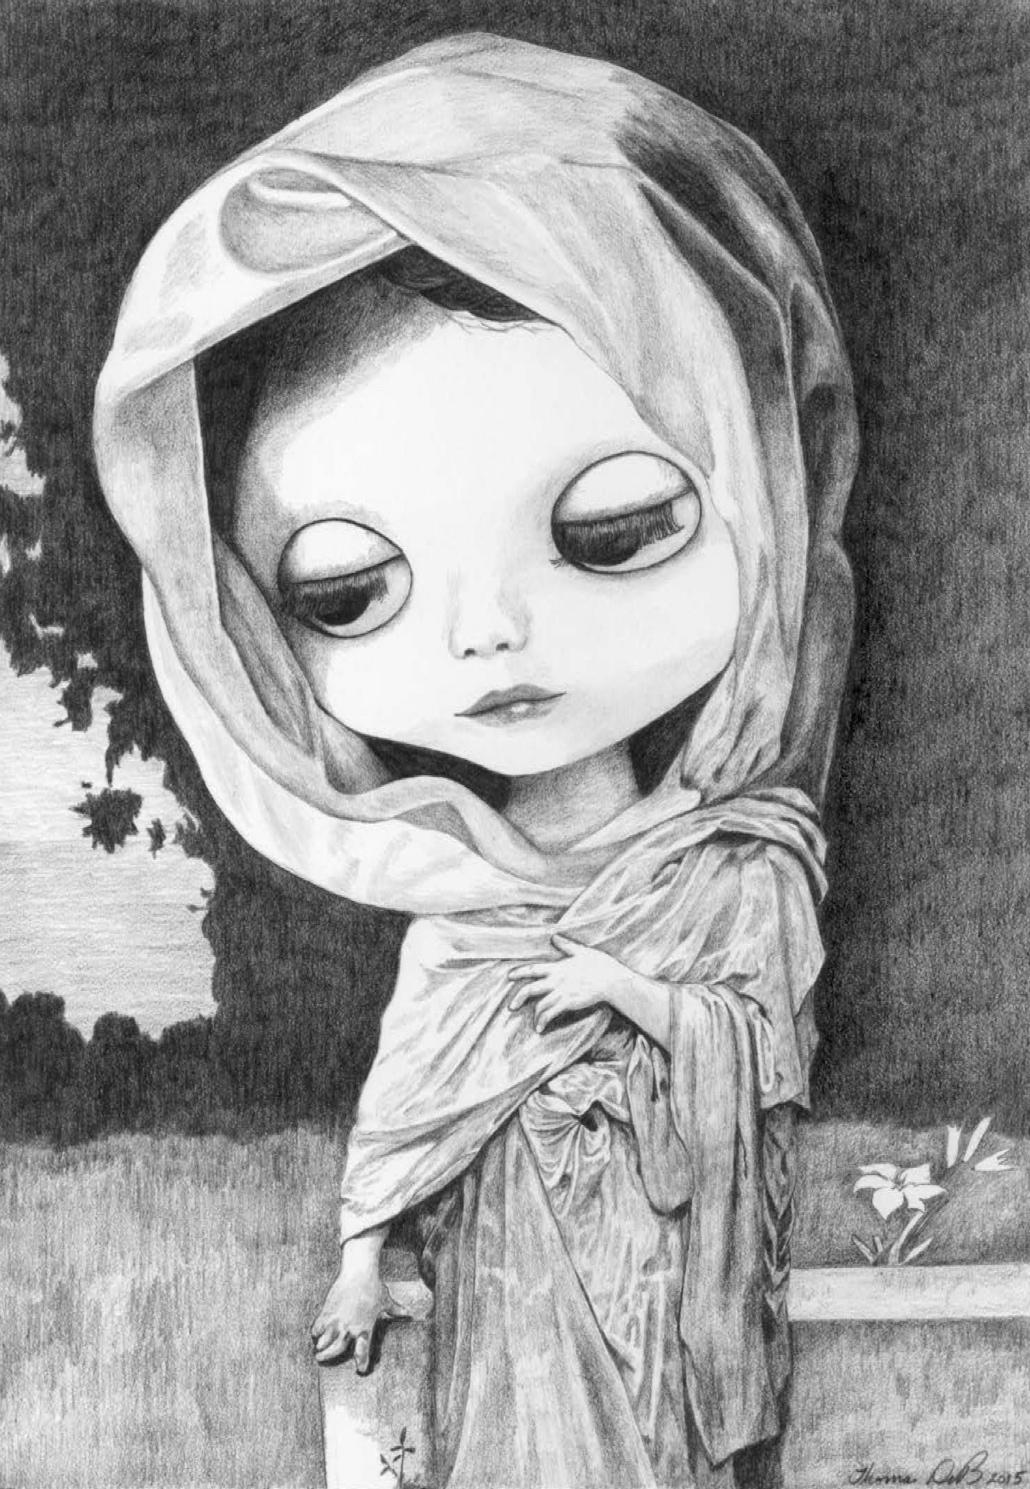 #14 - Modesty